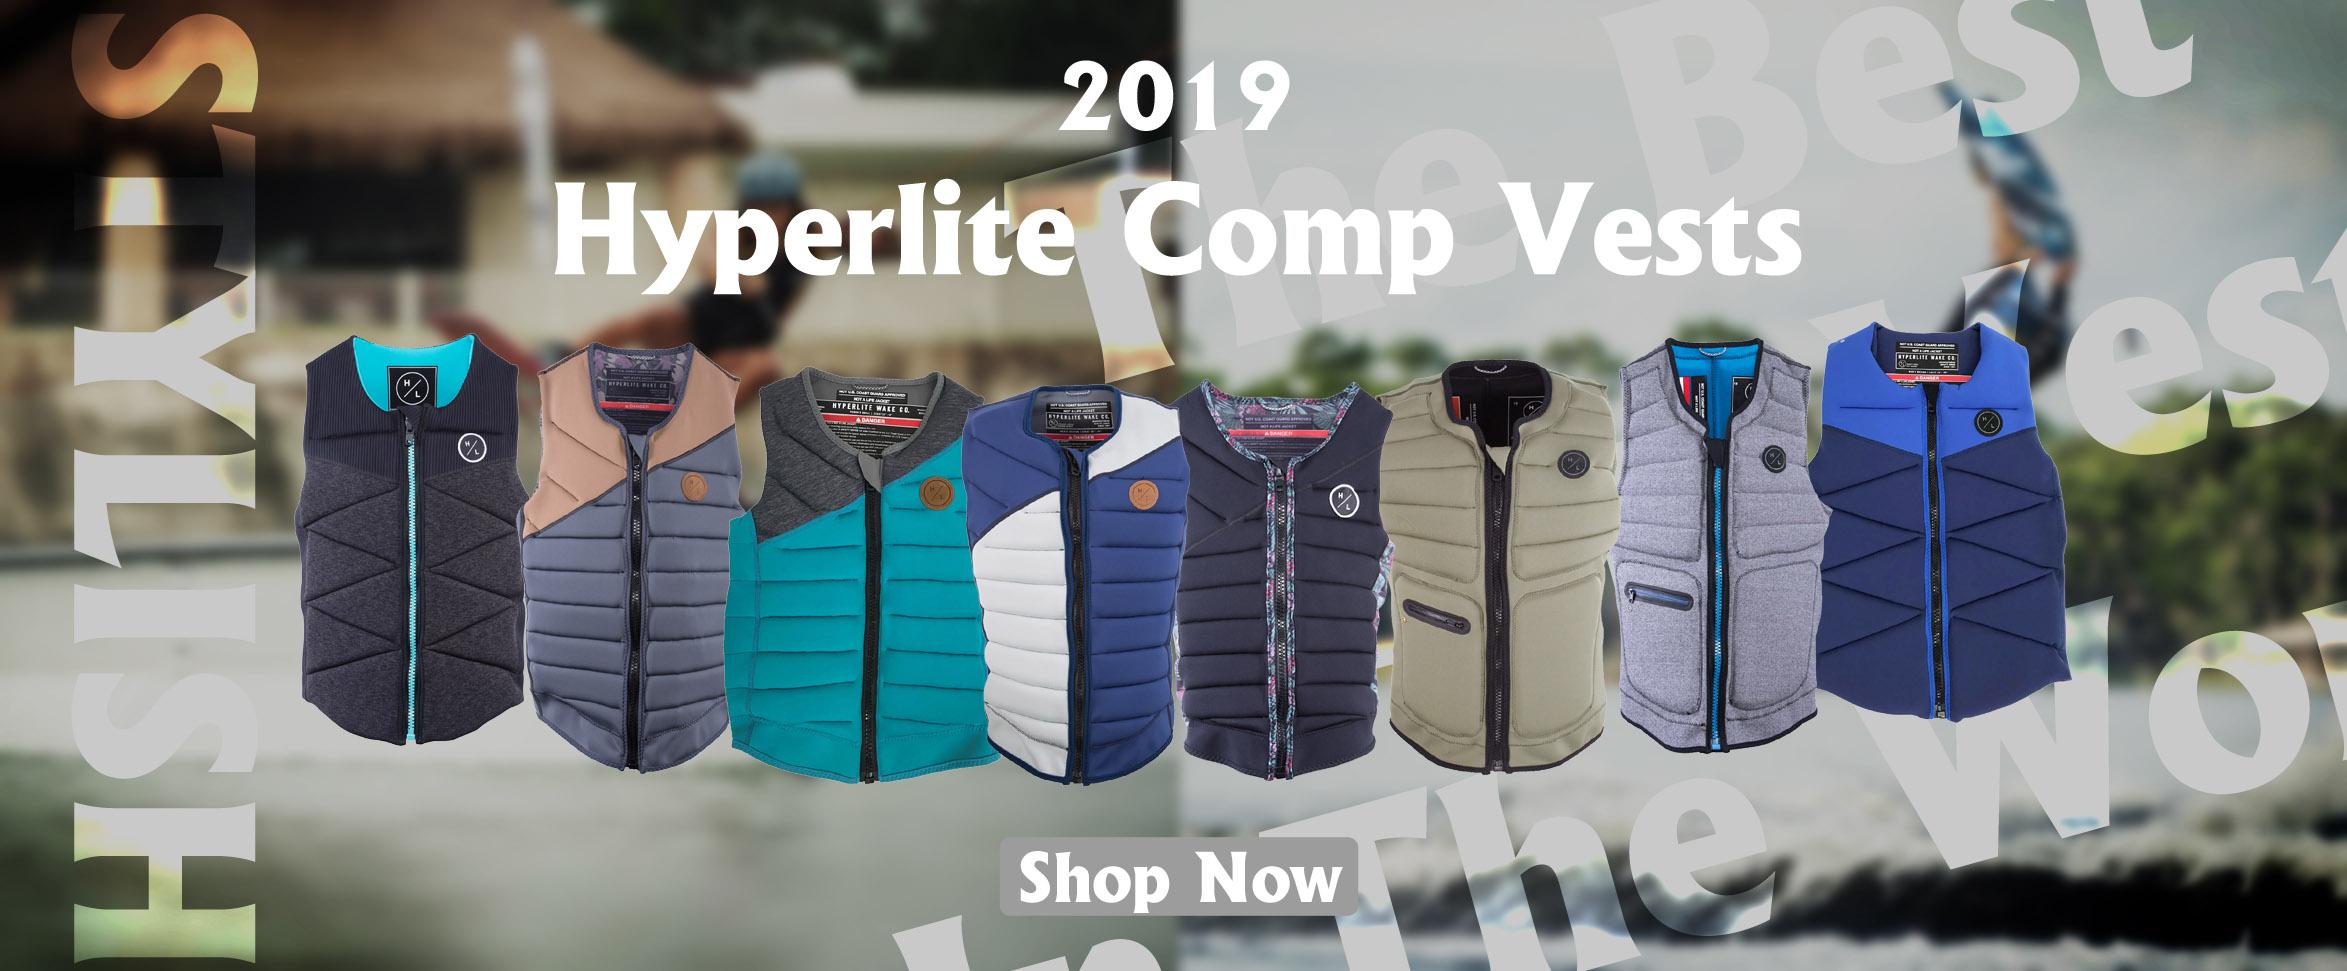 2019 Hyperlite Comp Vest Banner